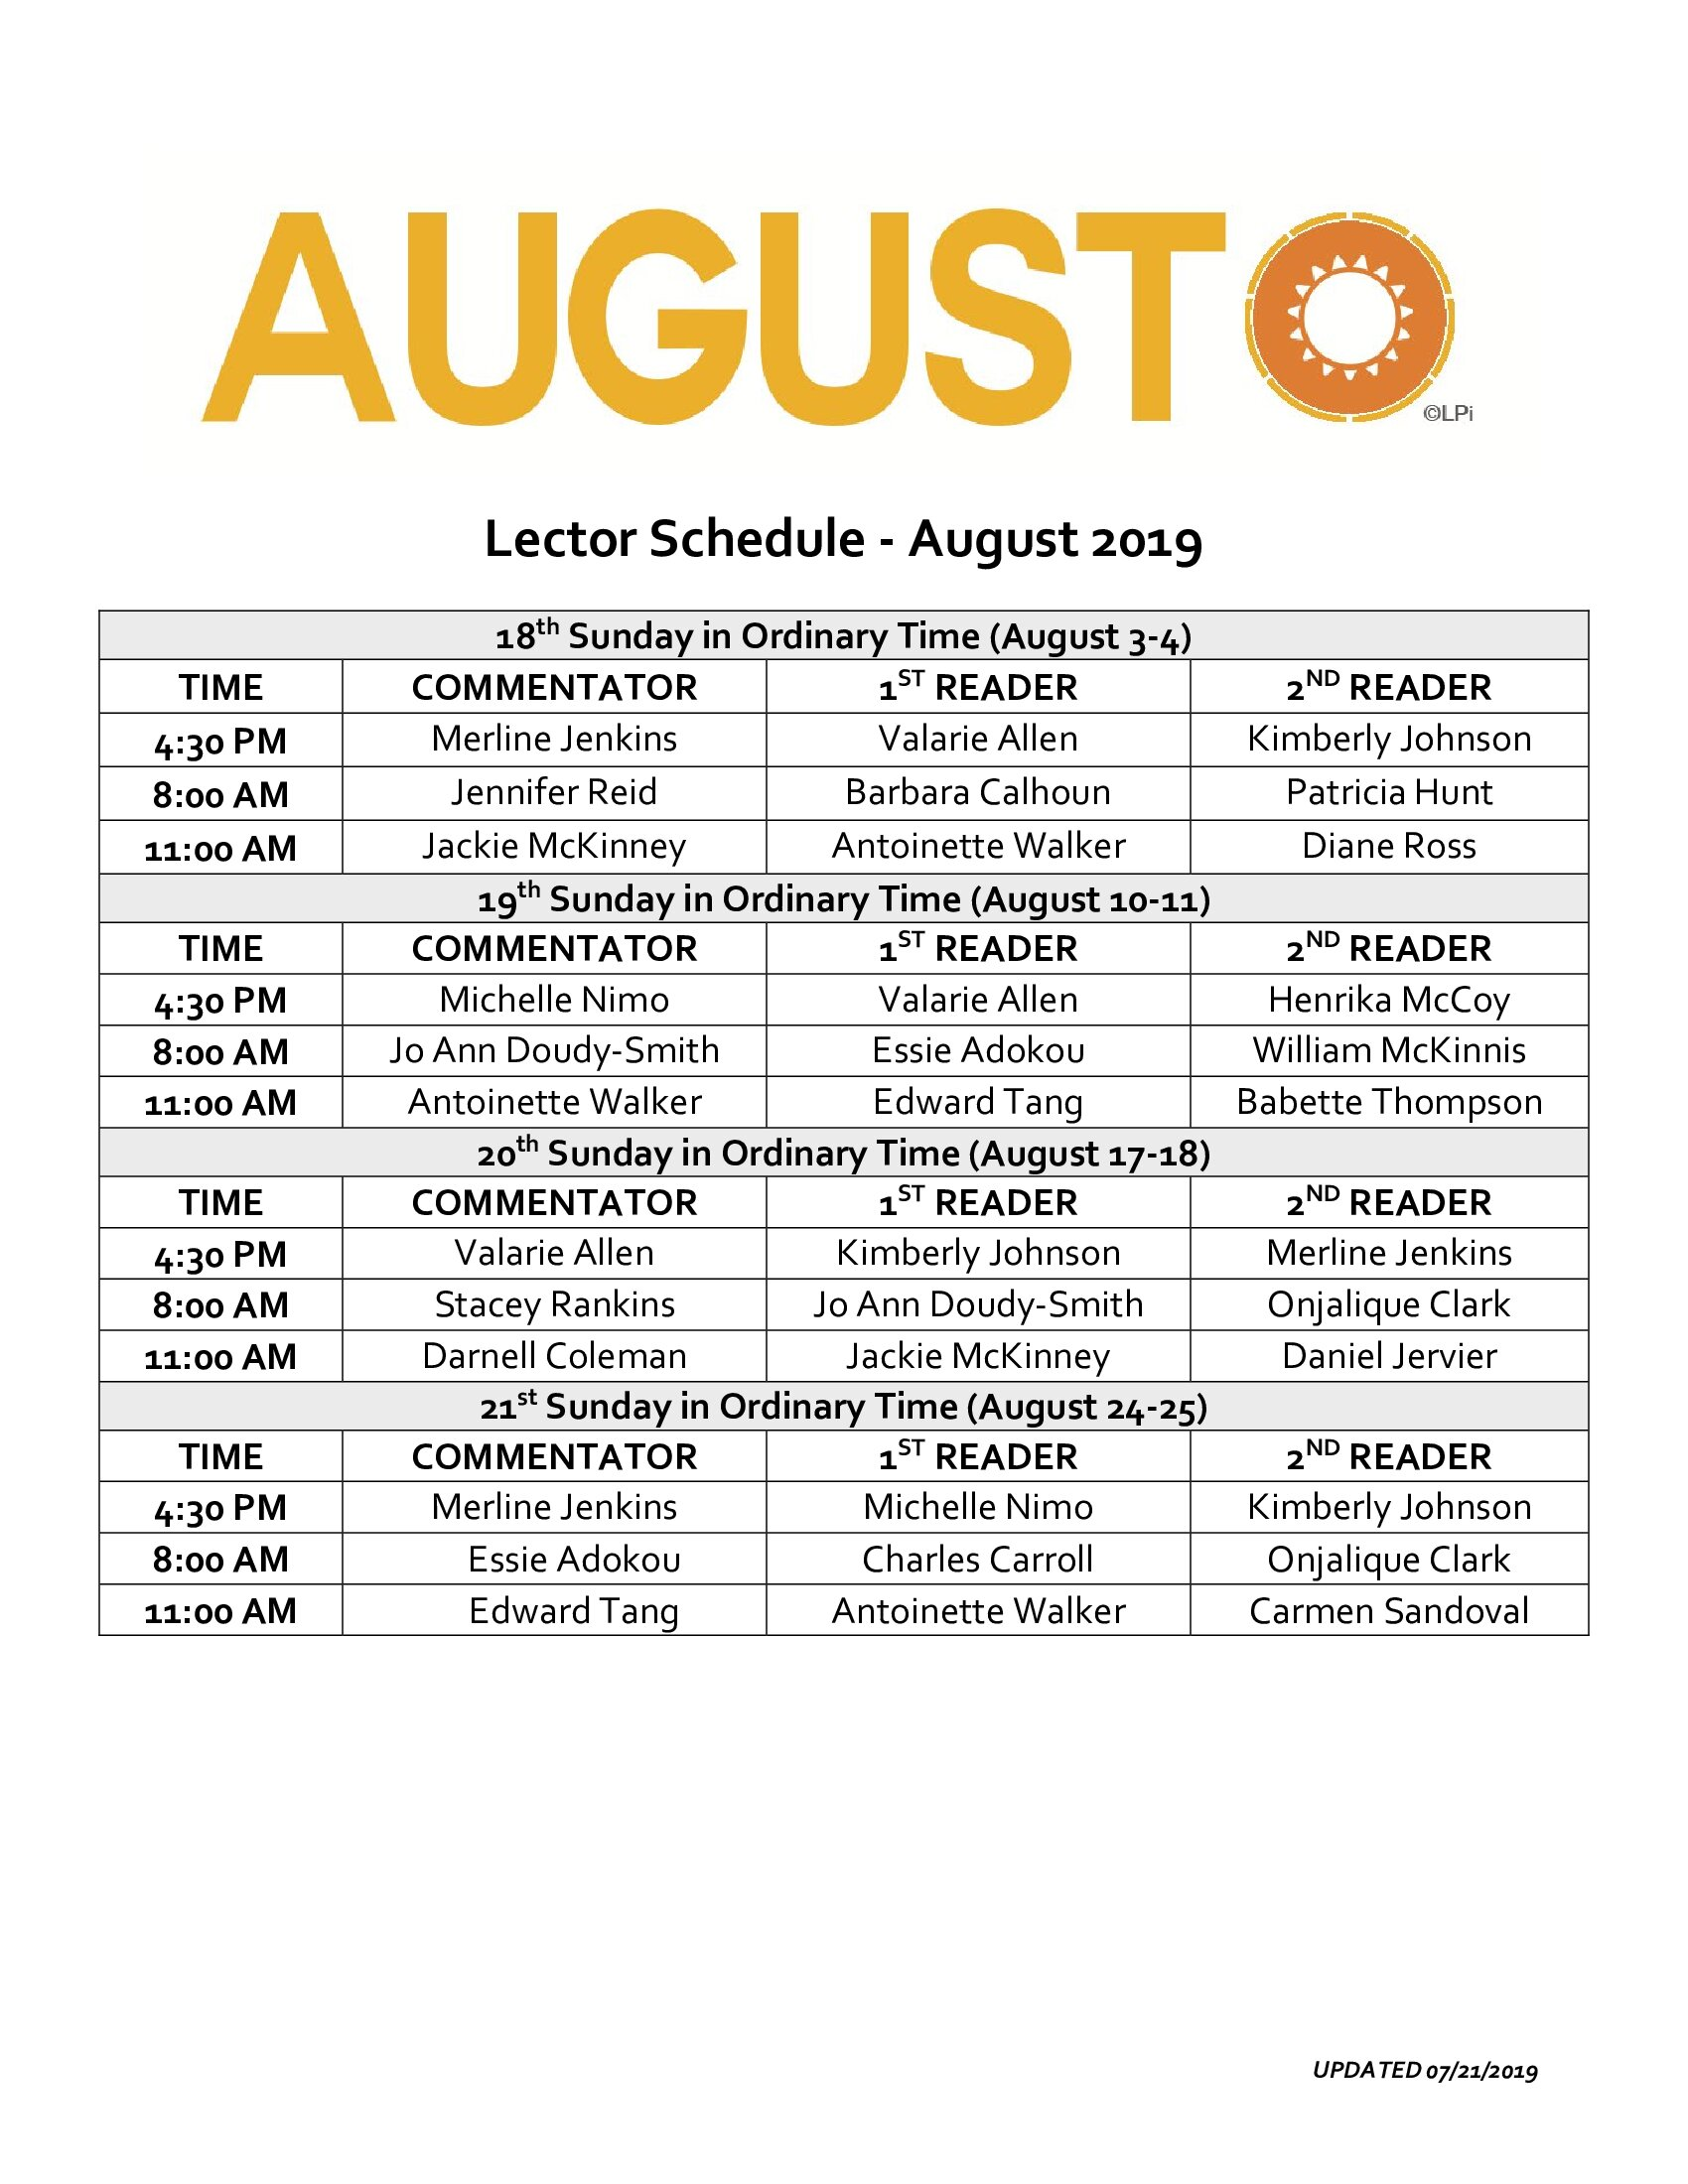 August 2019 Lector Schedule.jpg